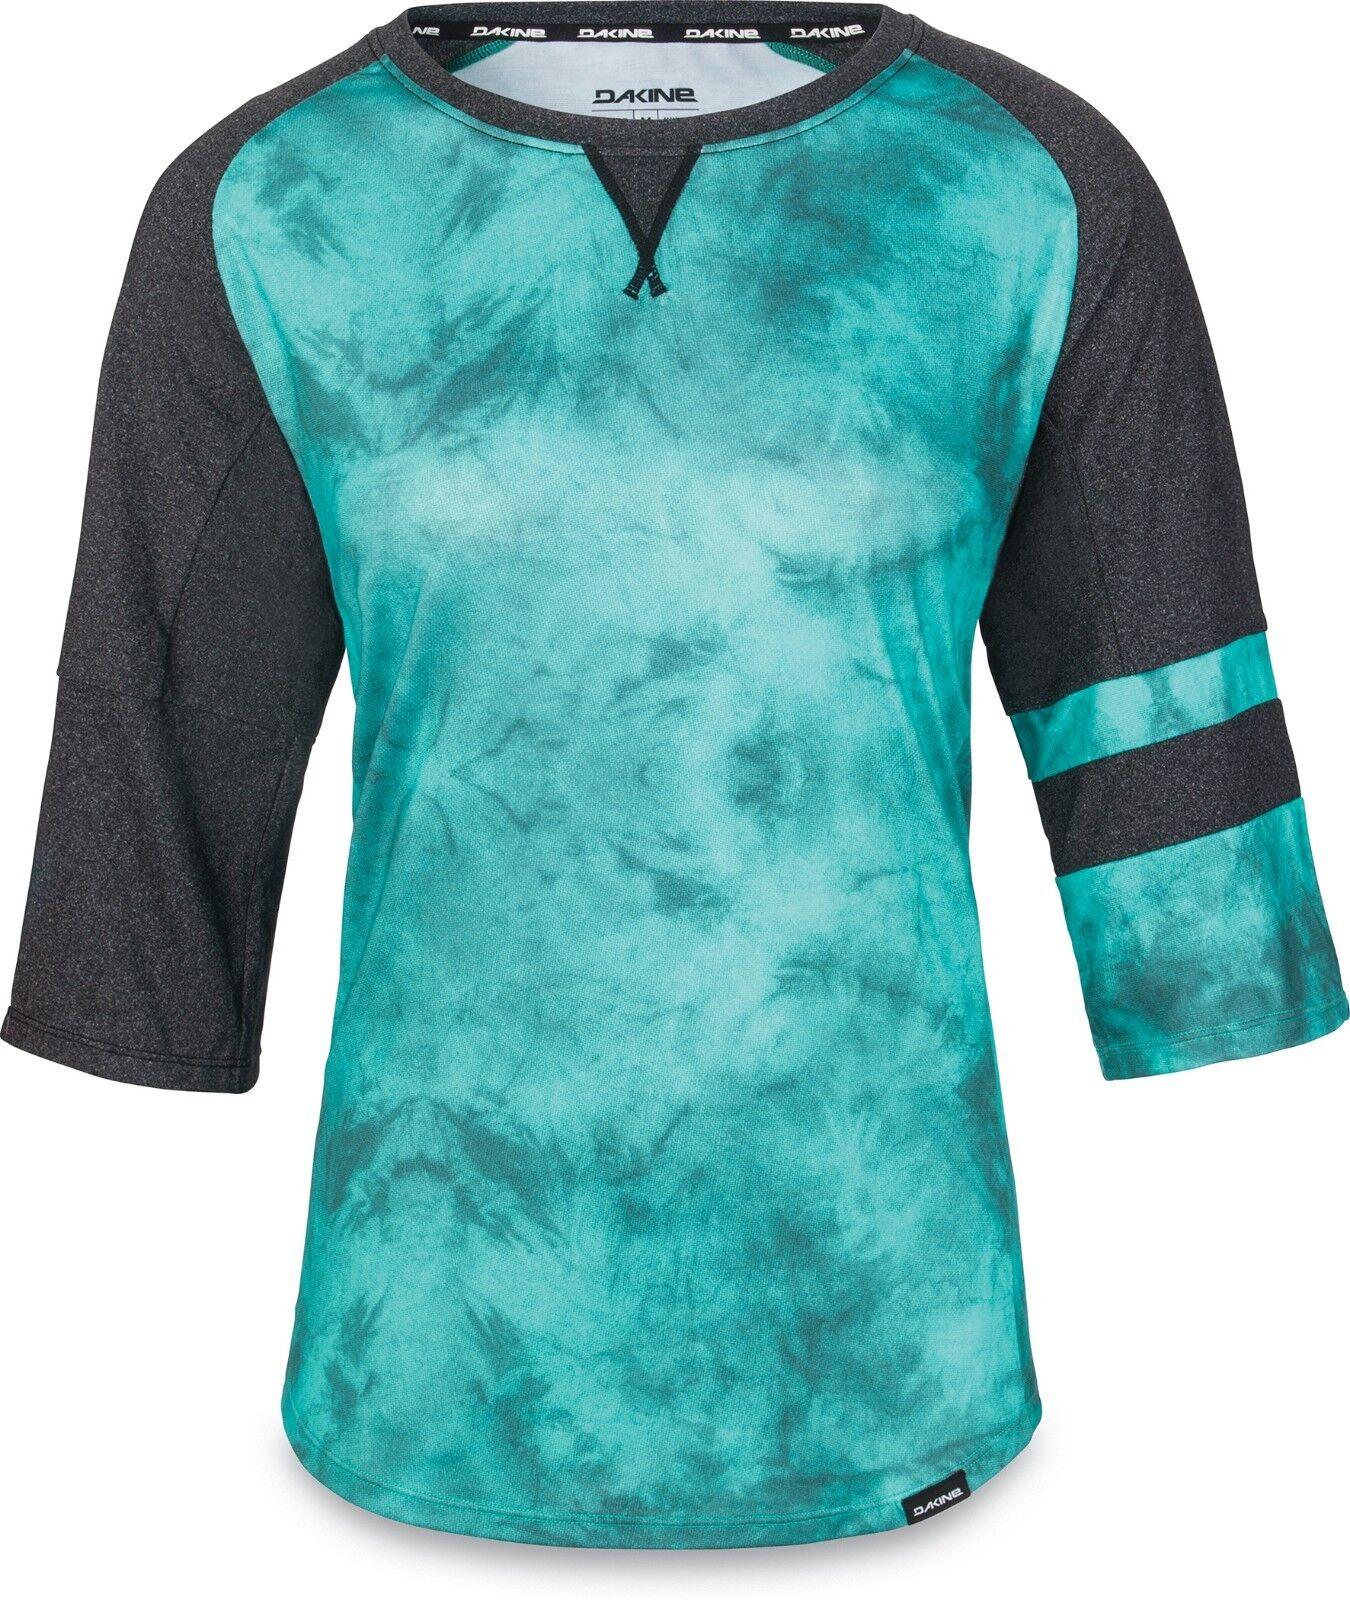 Dakine XENA Womens 3 4 Sleeve Cycling Jersey Medium Lagoon Haze NEW 2019 Sample